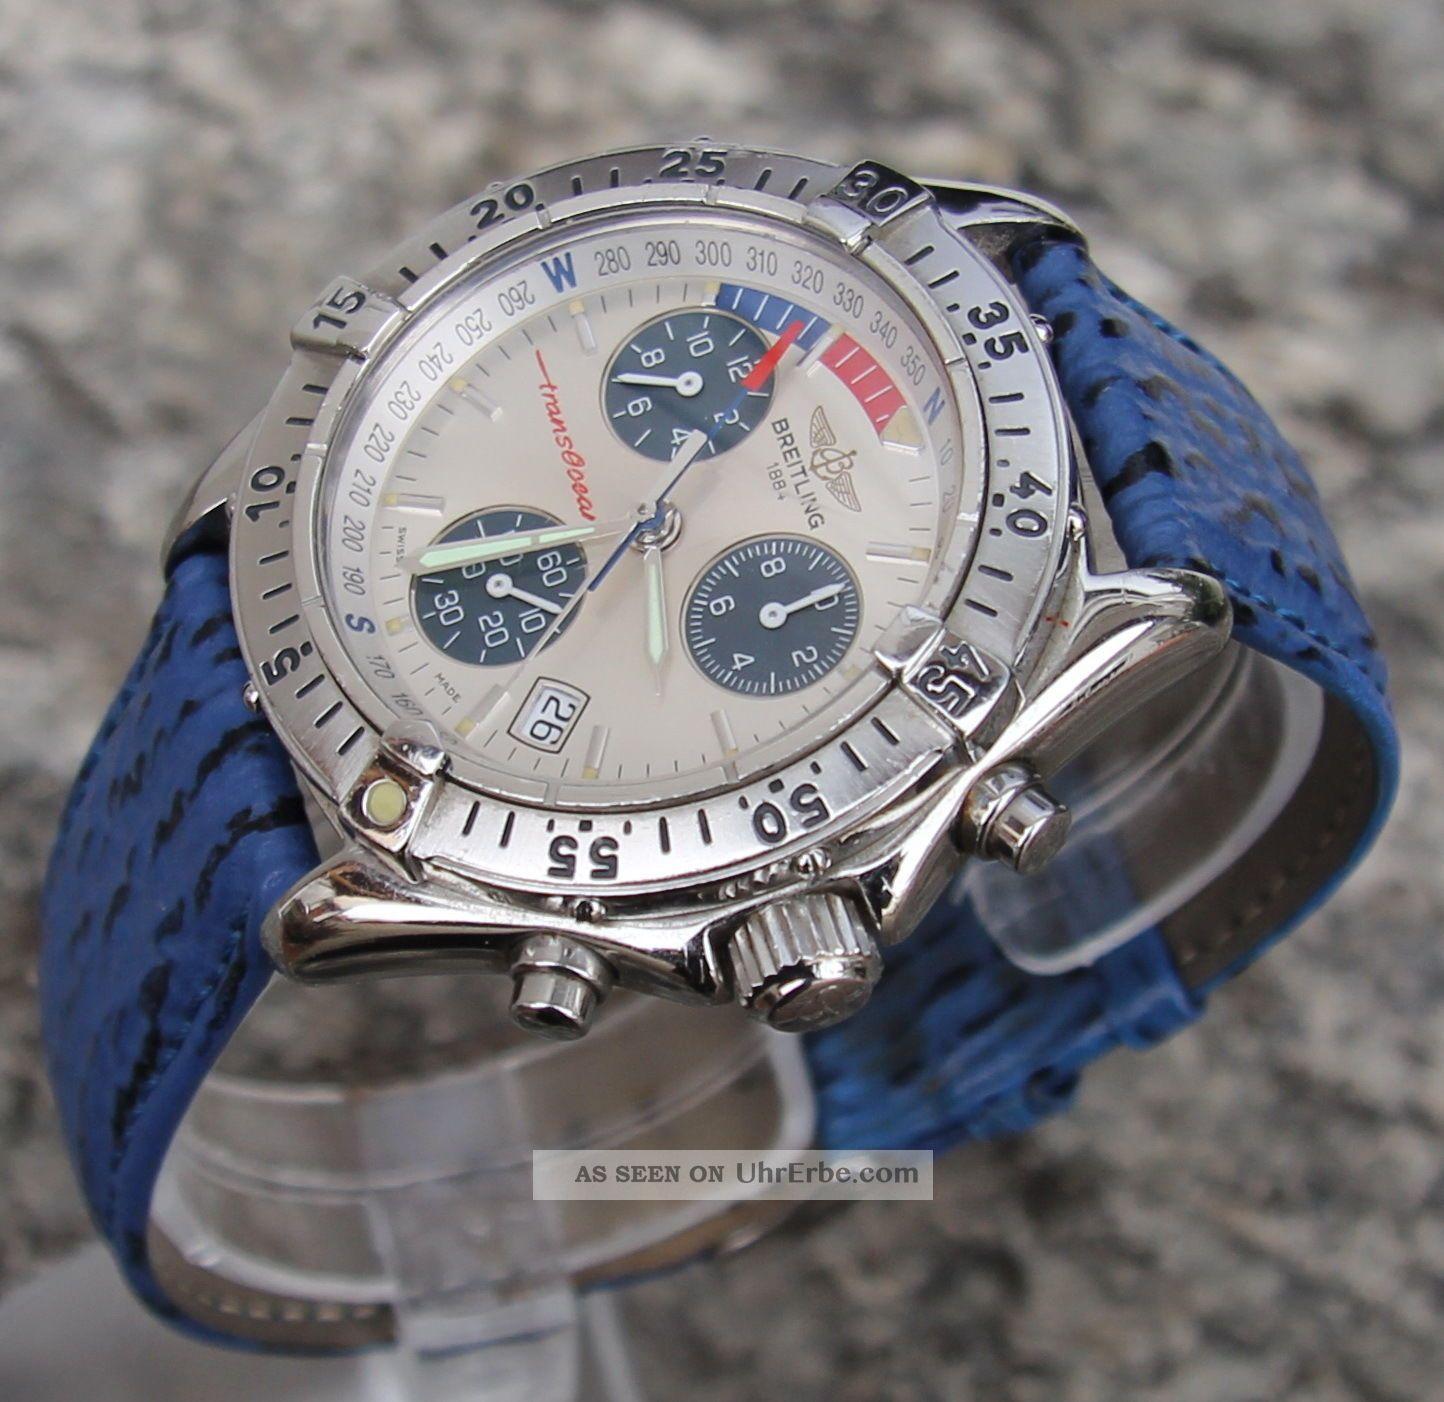 Breitling Transocean Yachting Shark Chronograph Ref.  A53340 Armbanduhren Bild